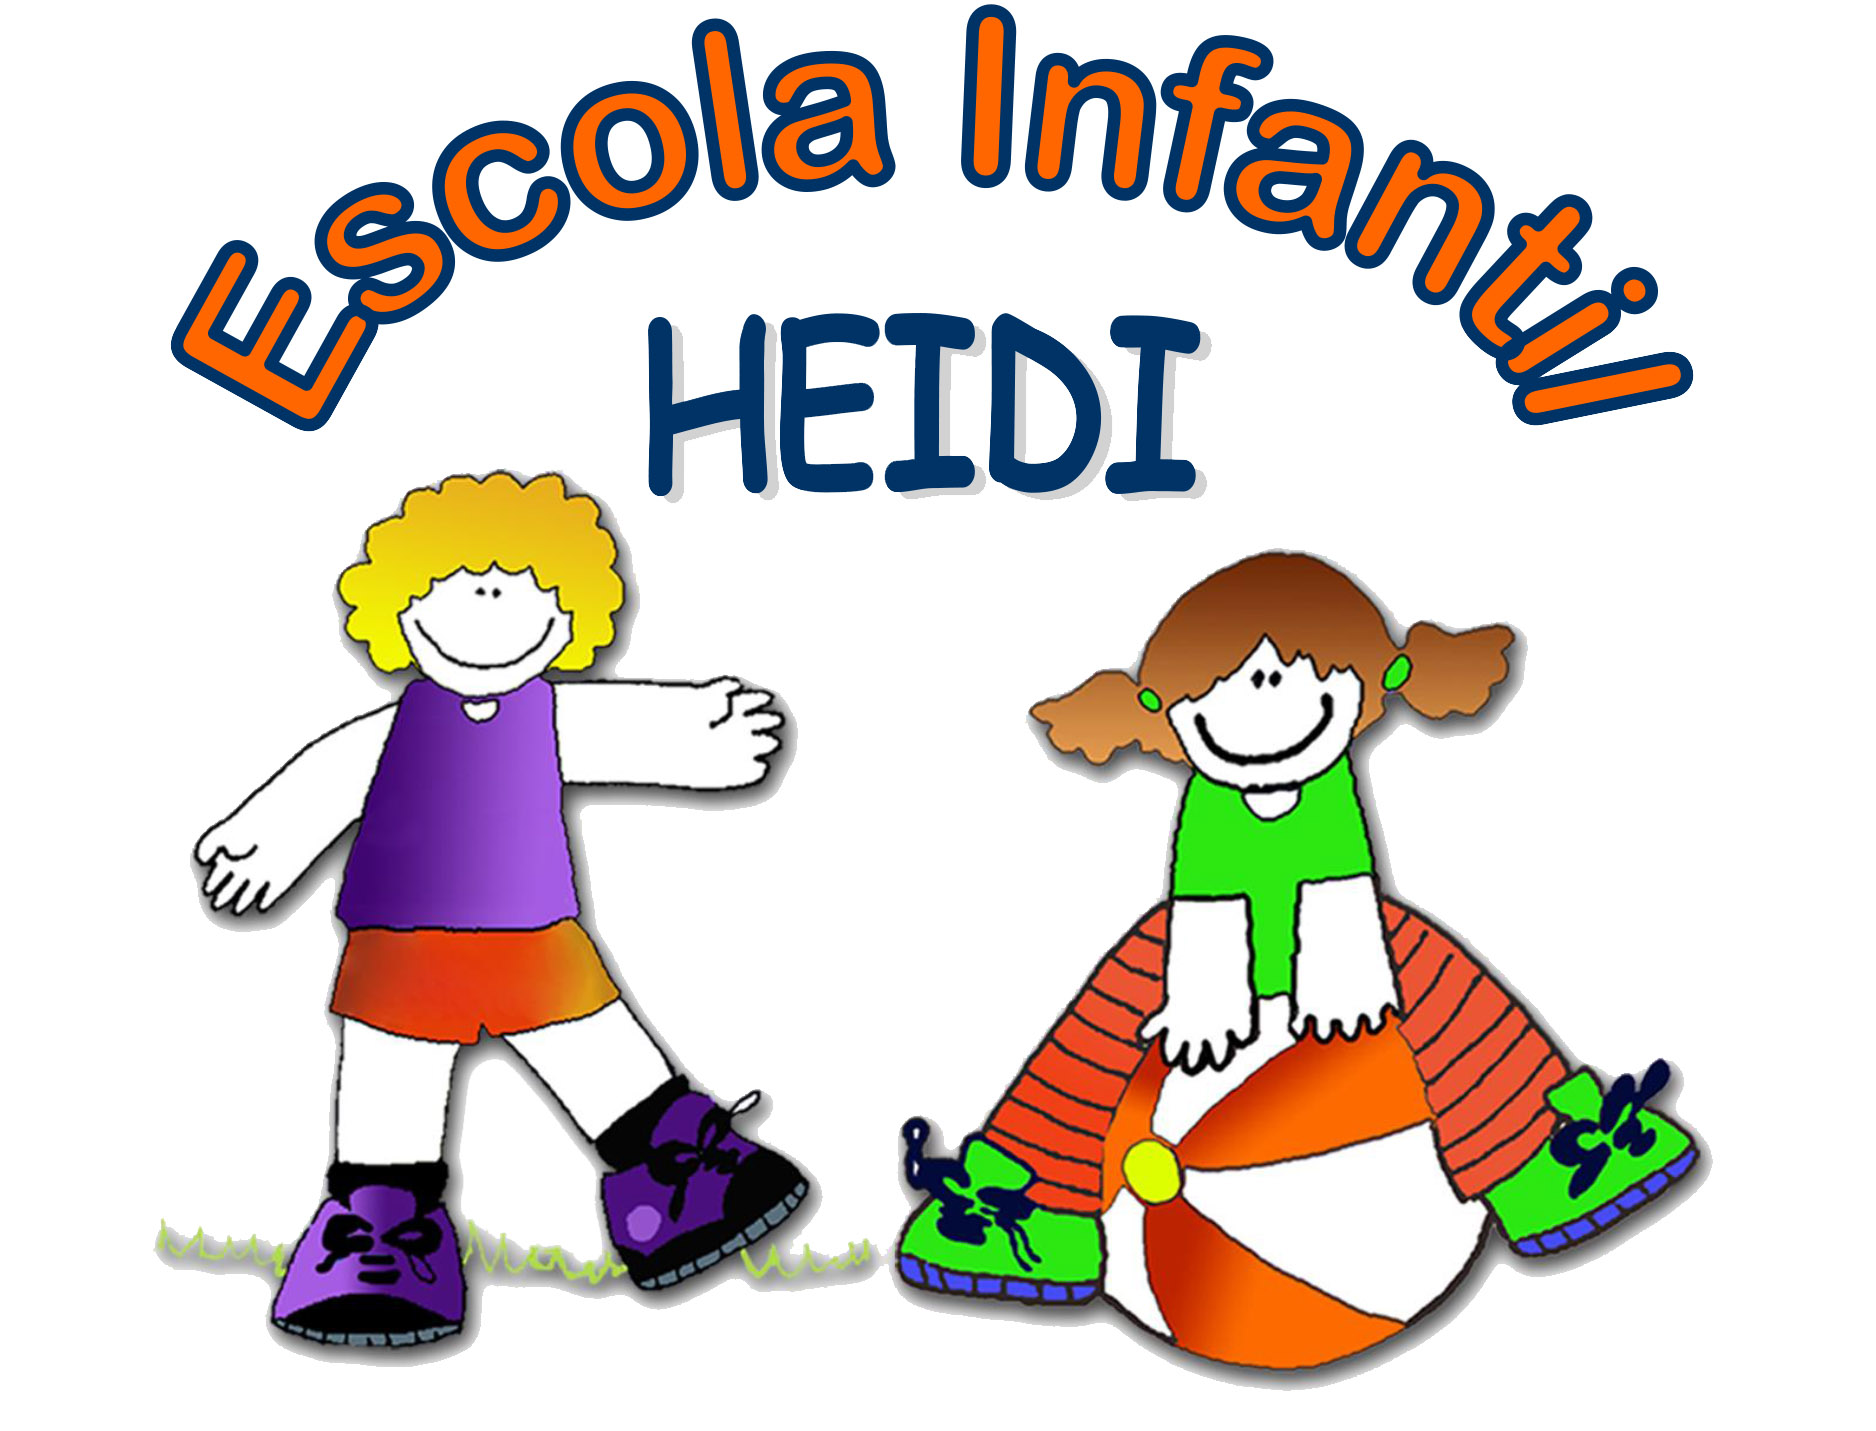 Escuela infantil Heidi